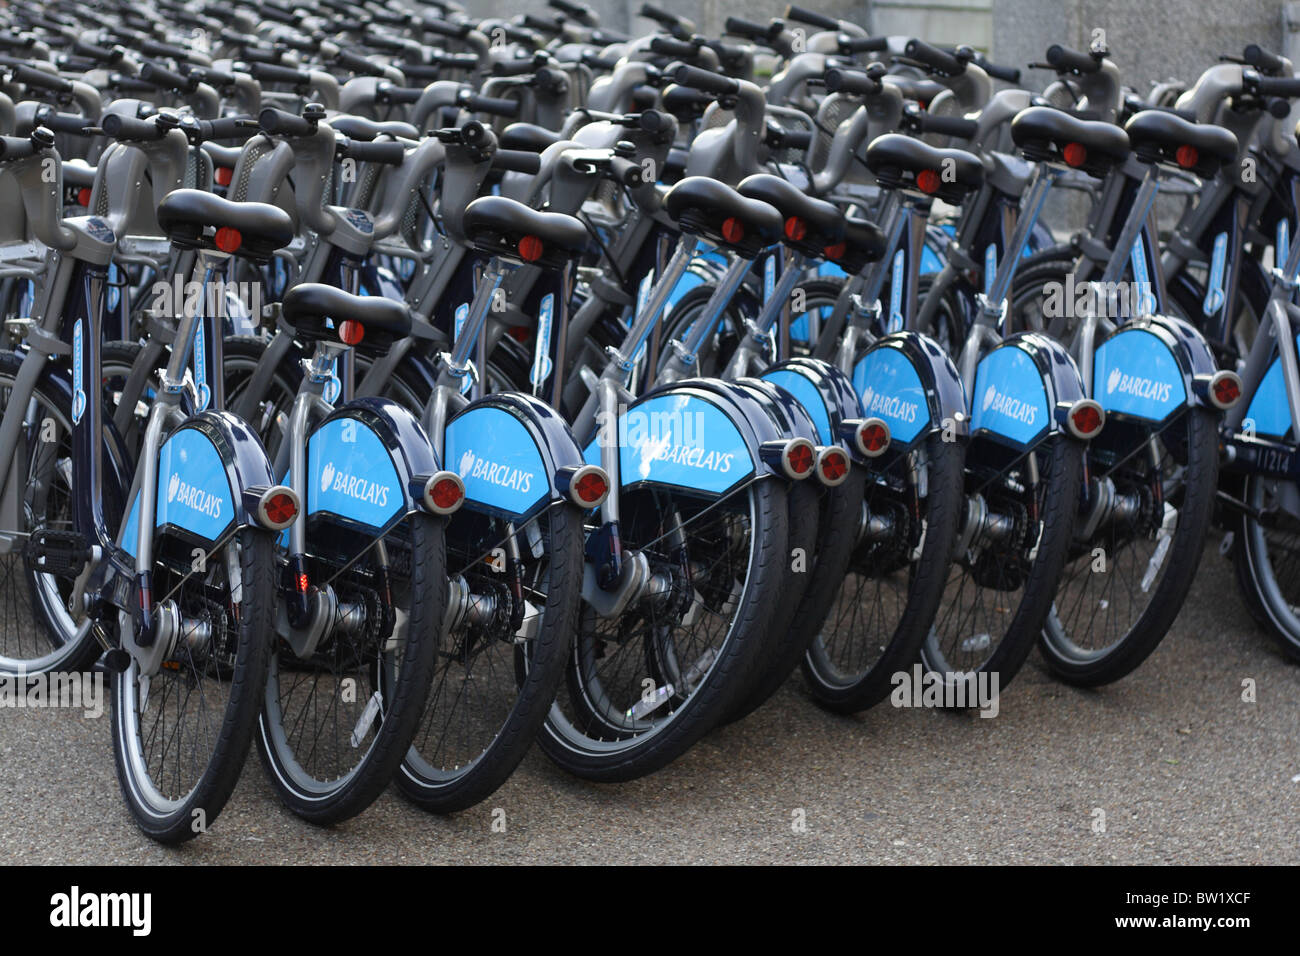 TFL london bike hire scheme - Stock Image